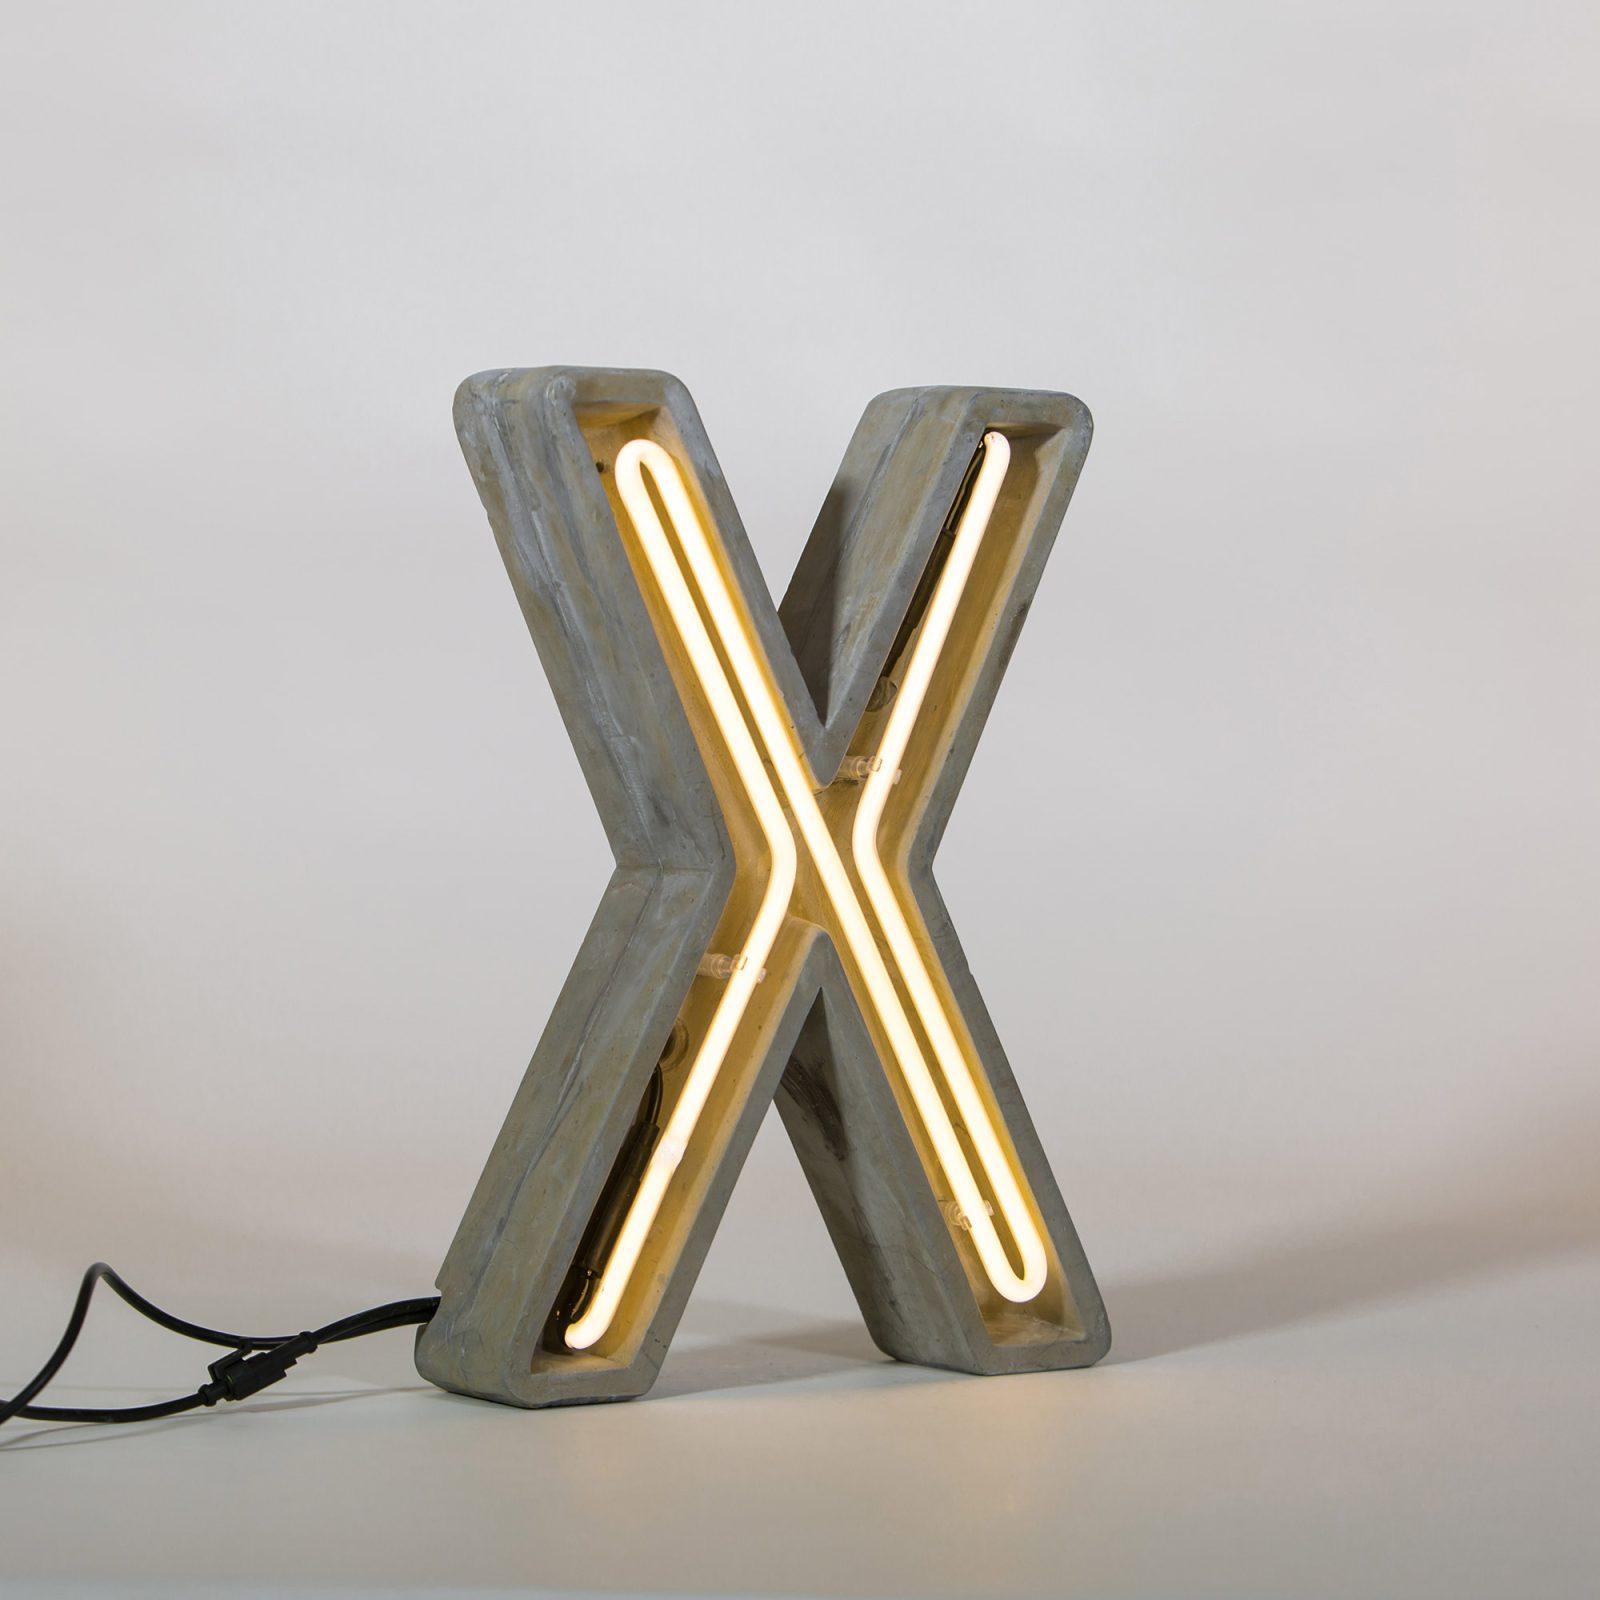 Alphacrete, Concrete Neon Light – X-32281